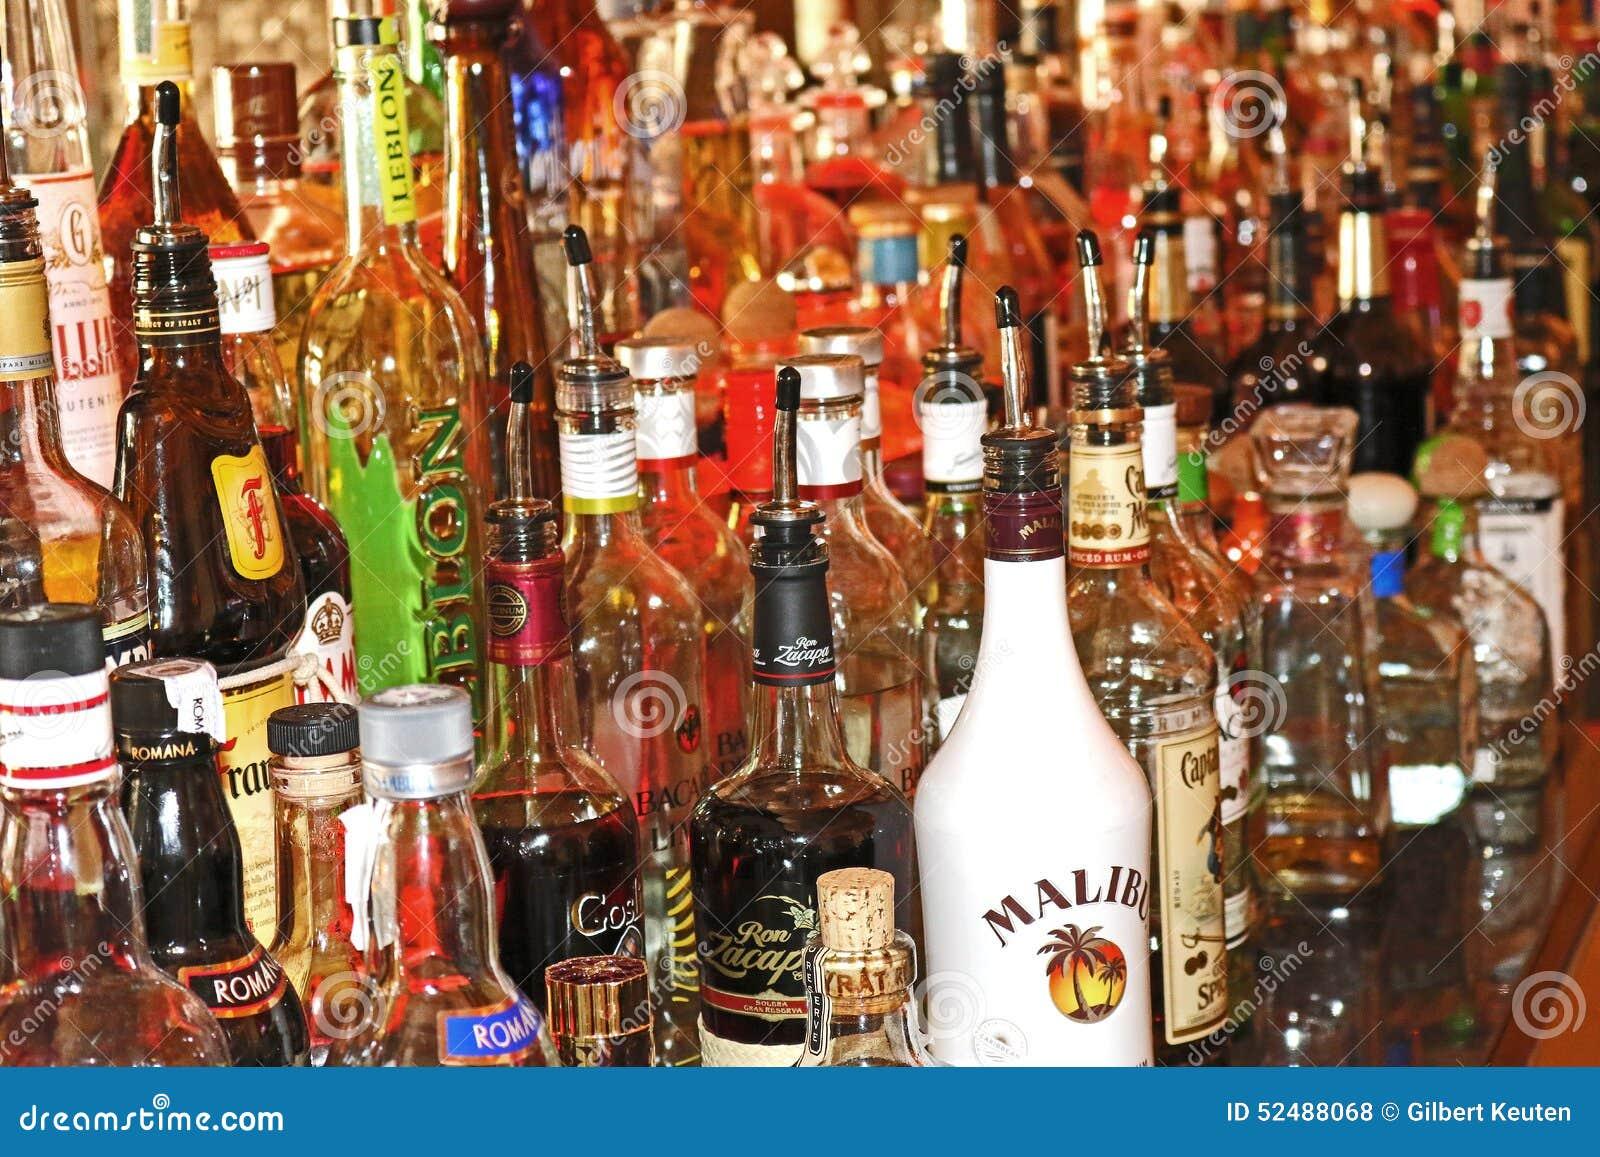 alkohol flaschen redaktionelles stockfoto bild 52488068. Black Bedroom Furniture Sets. Home Design Ideas